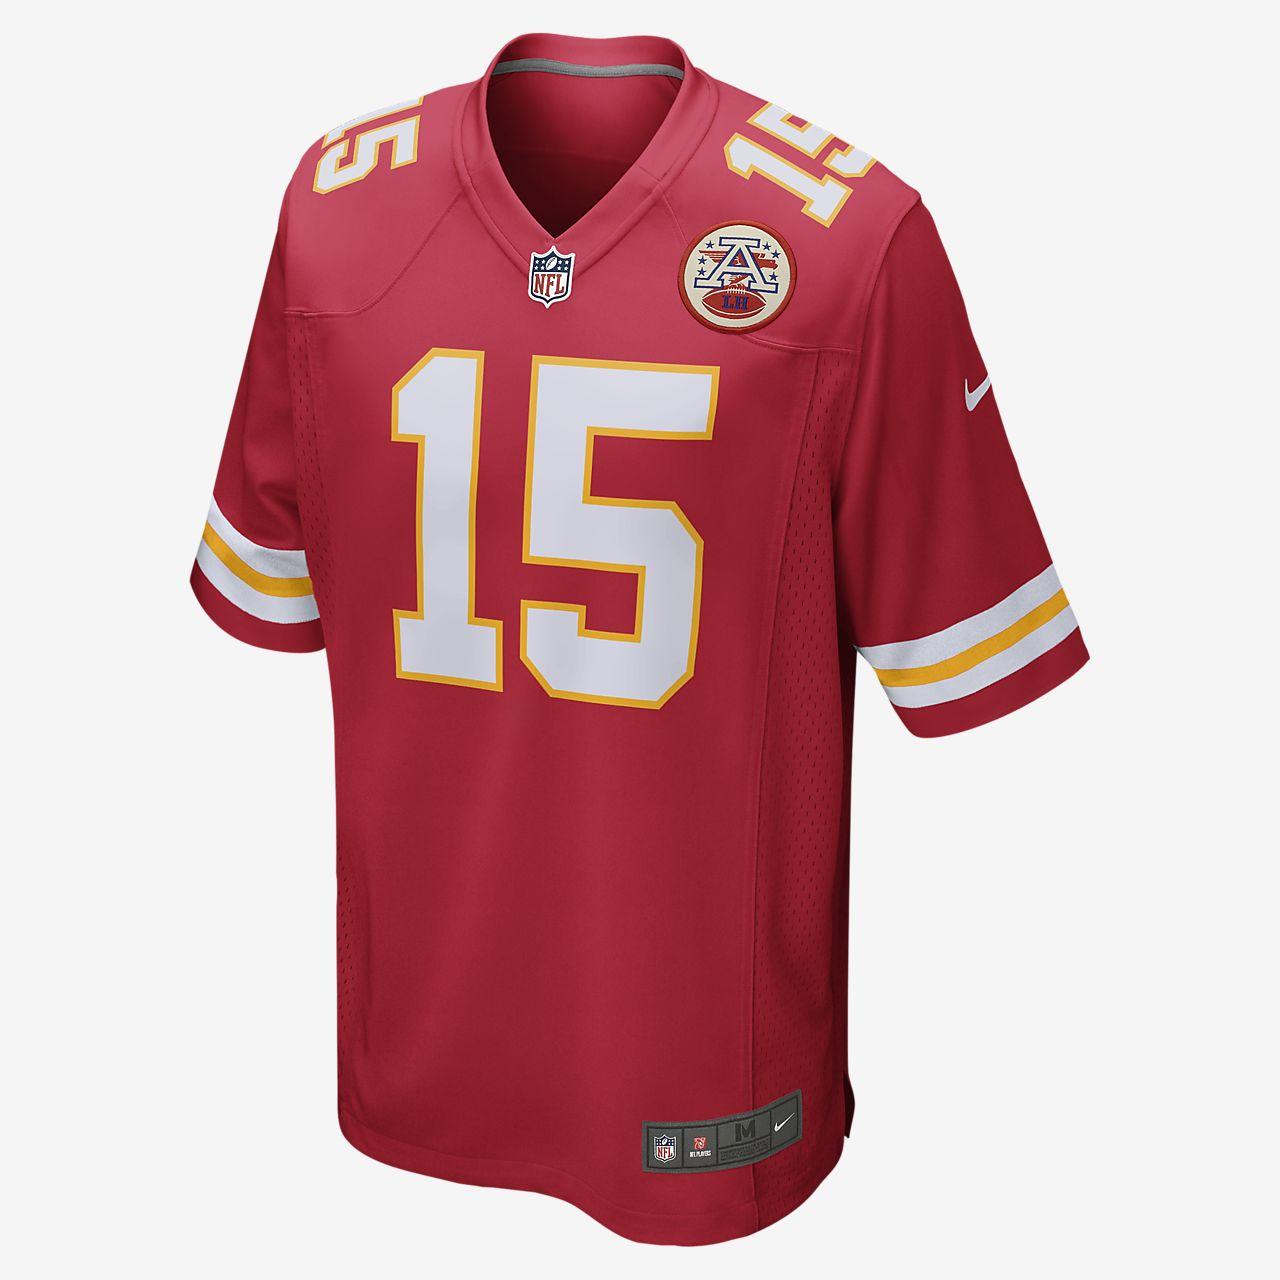 0d5f5367513 NFL Kansas City Chiefs (Mahomes) Men's Football Game Jersey. Nike.com